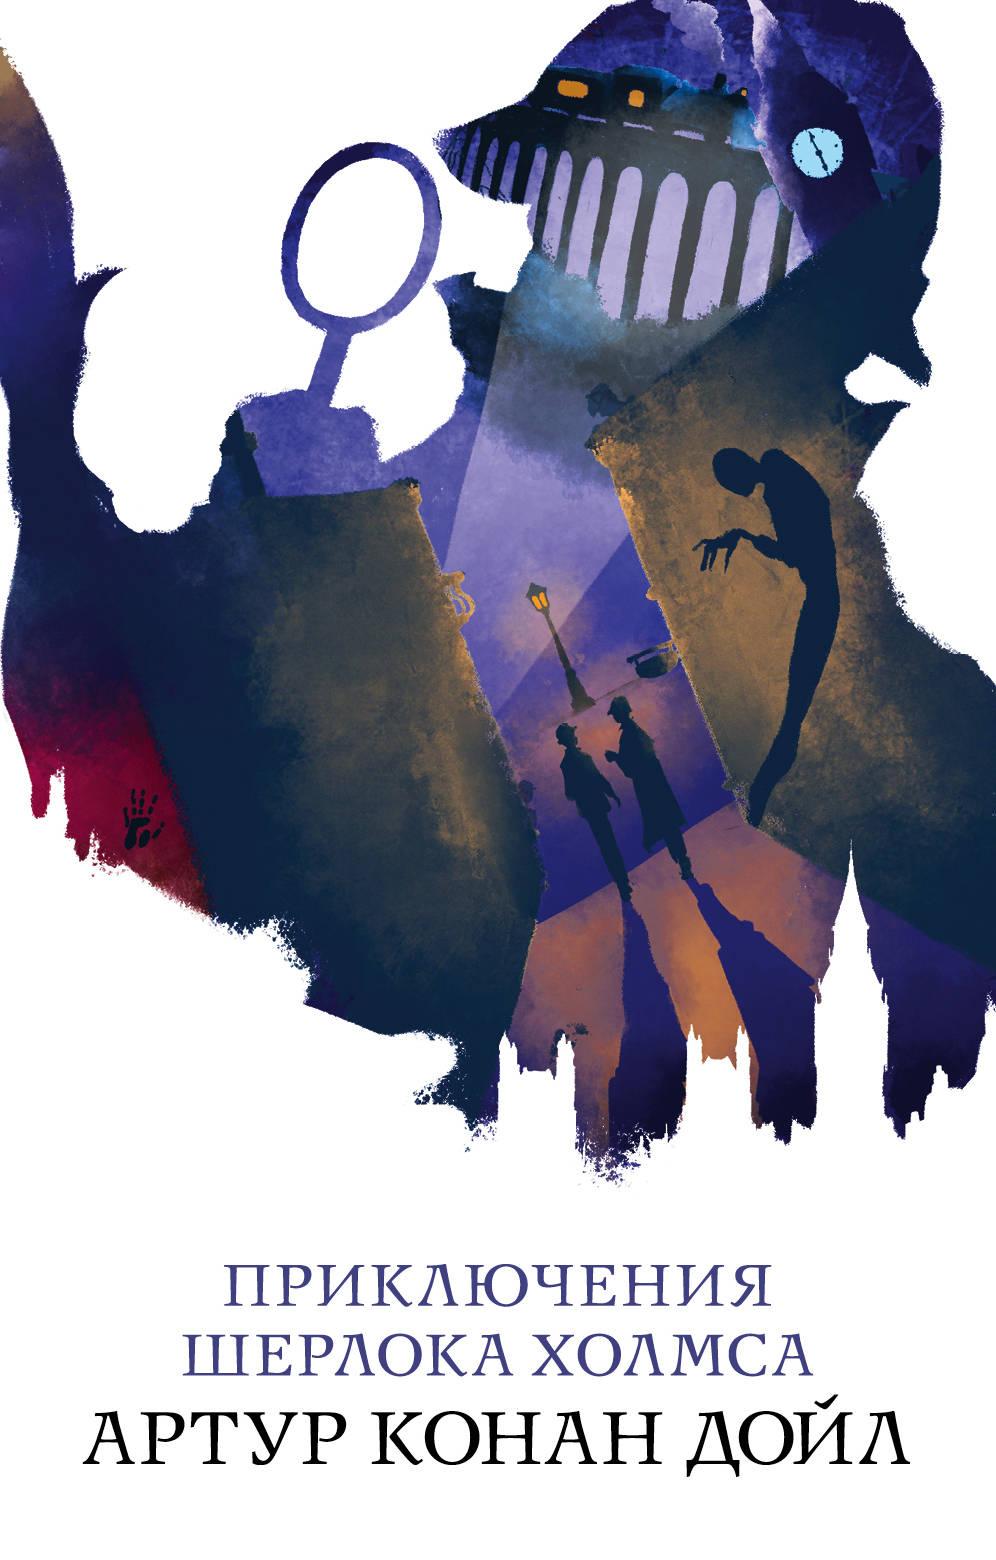 Артур Конан Дойл Приключения Шерлока Холмса велосипед forward twister 24 1 0 2019